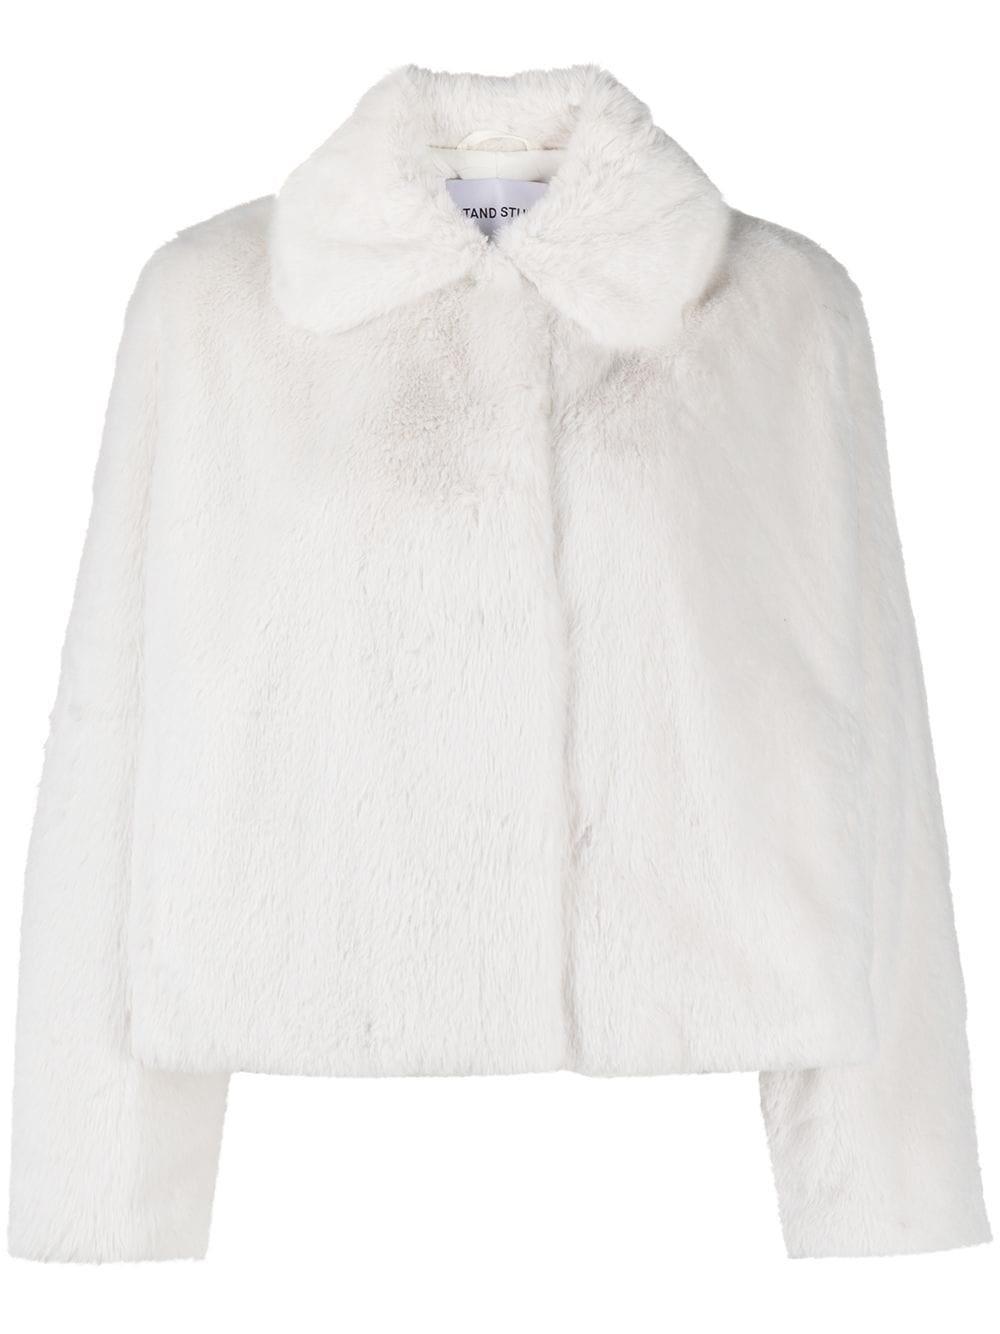 "STAND STUDIO ""Marcela"" Fur Effect Coat"